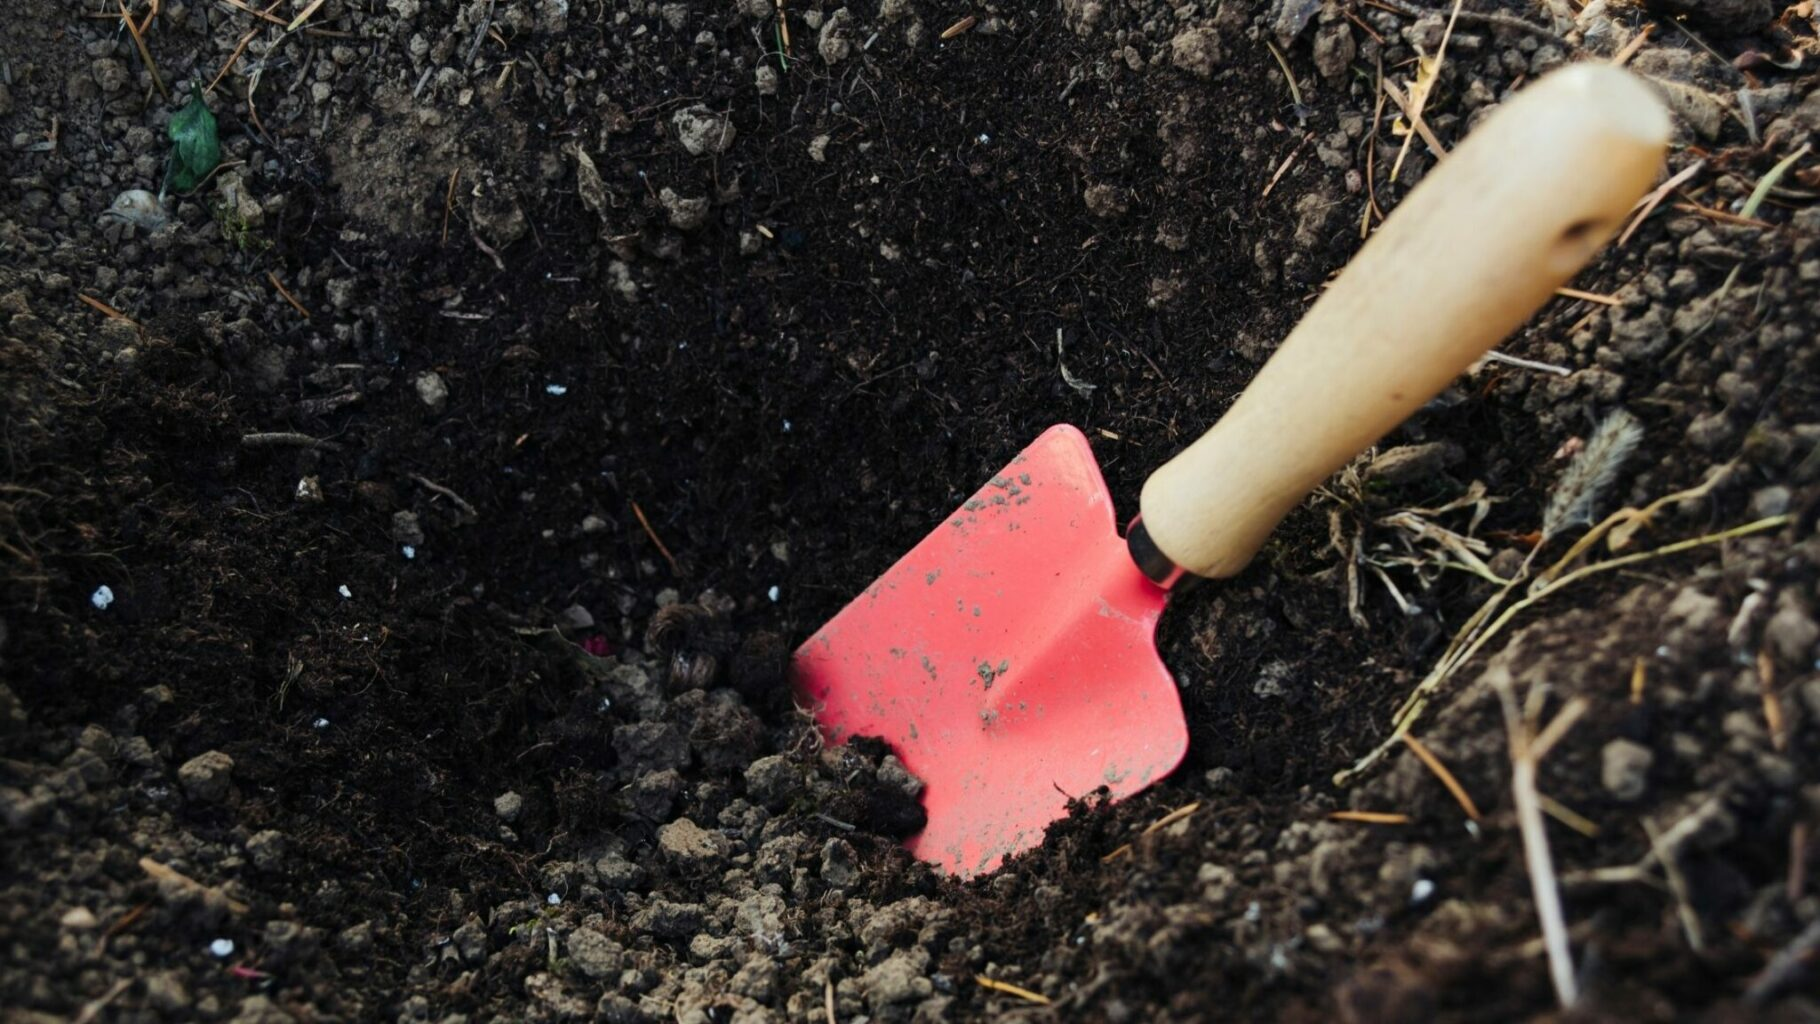 trowel in a hole of good soil